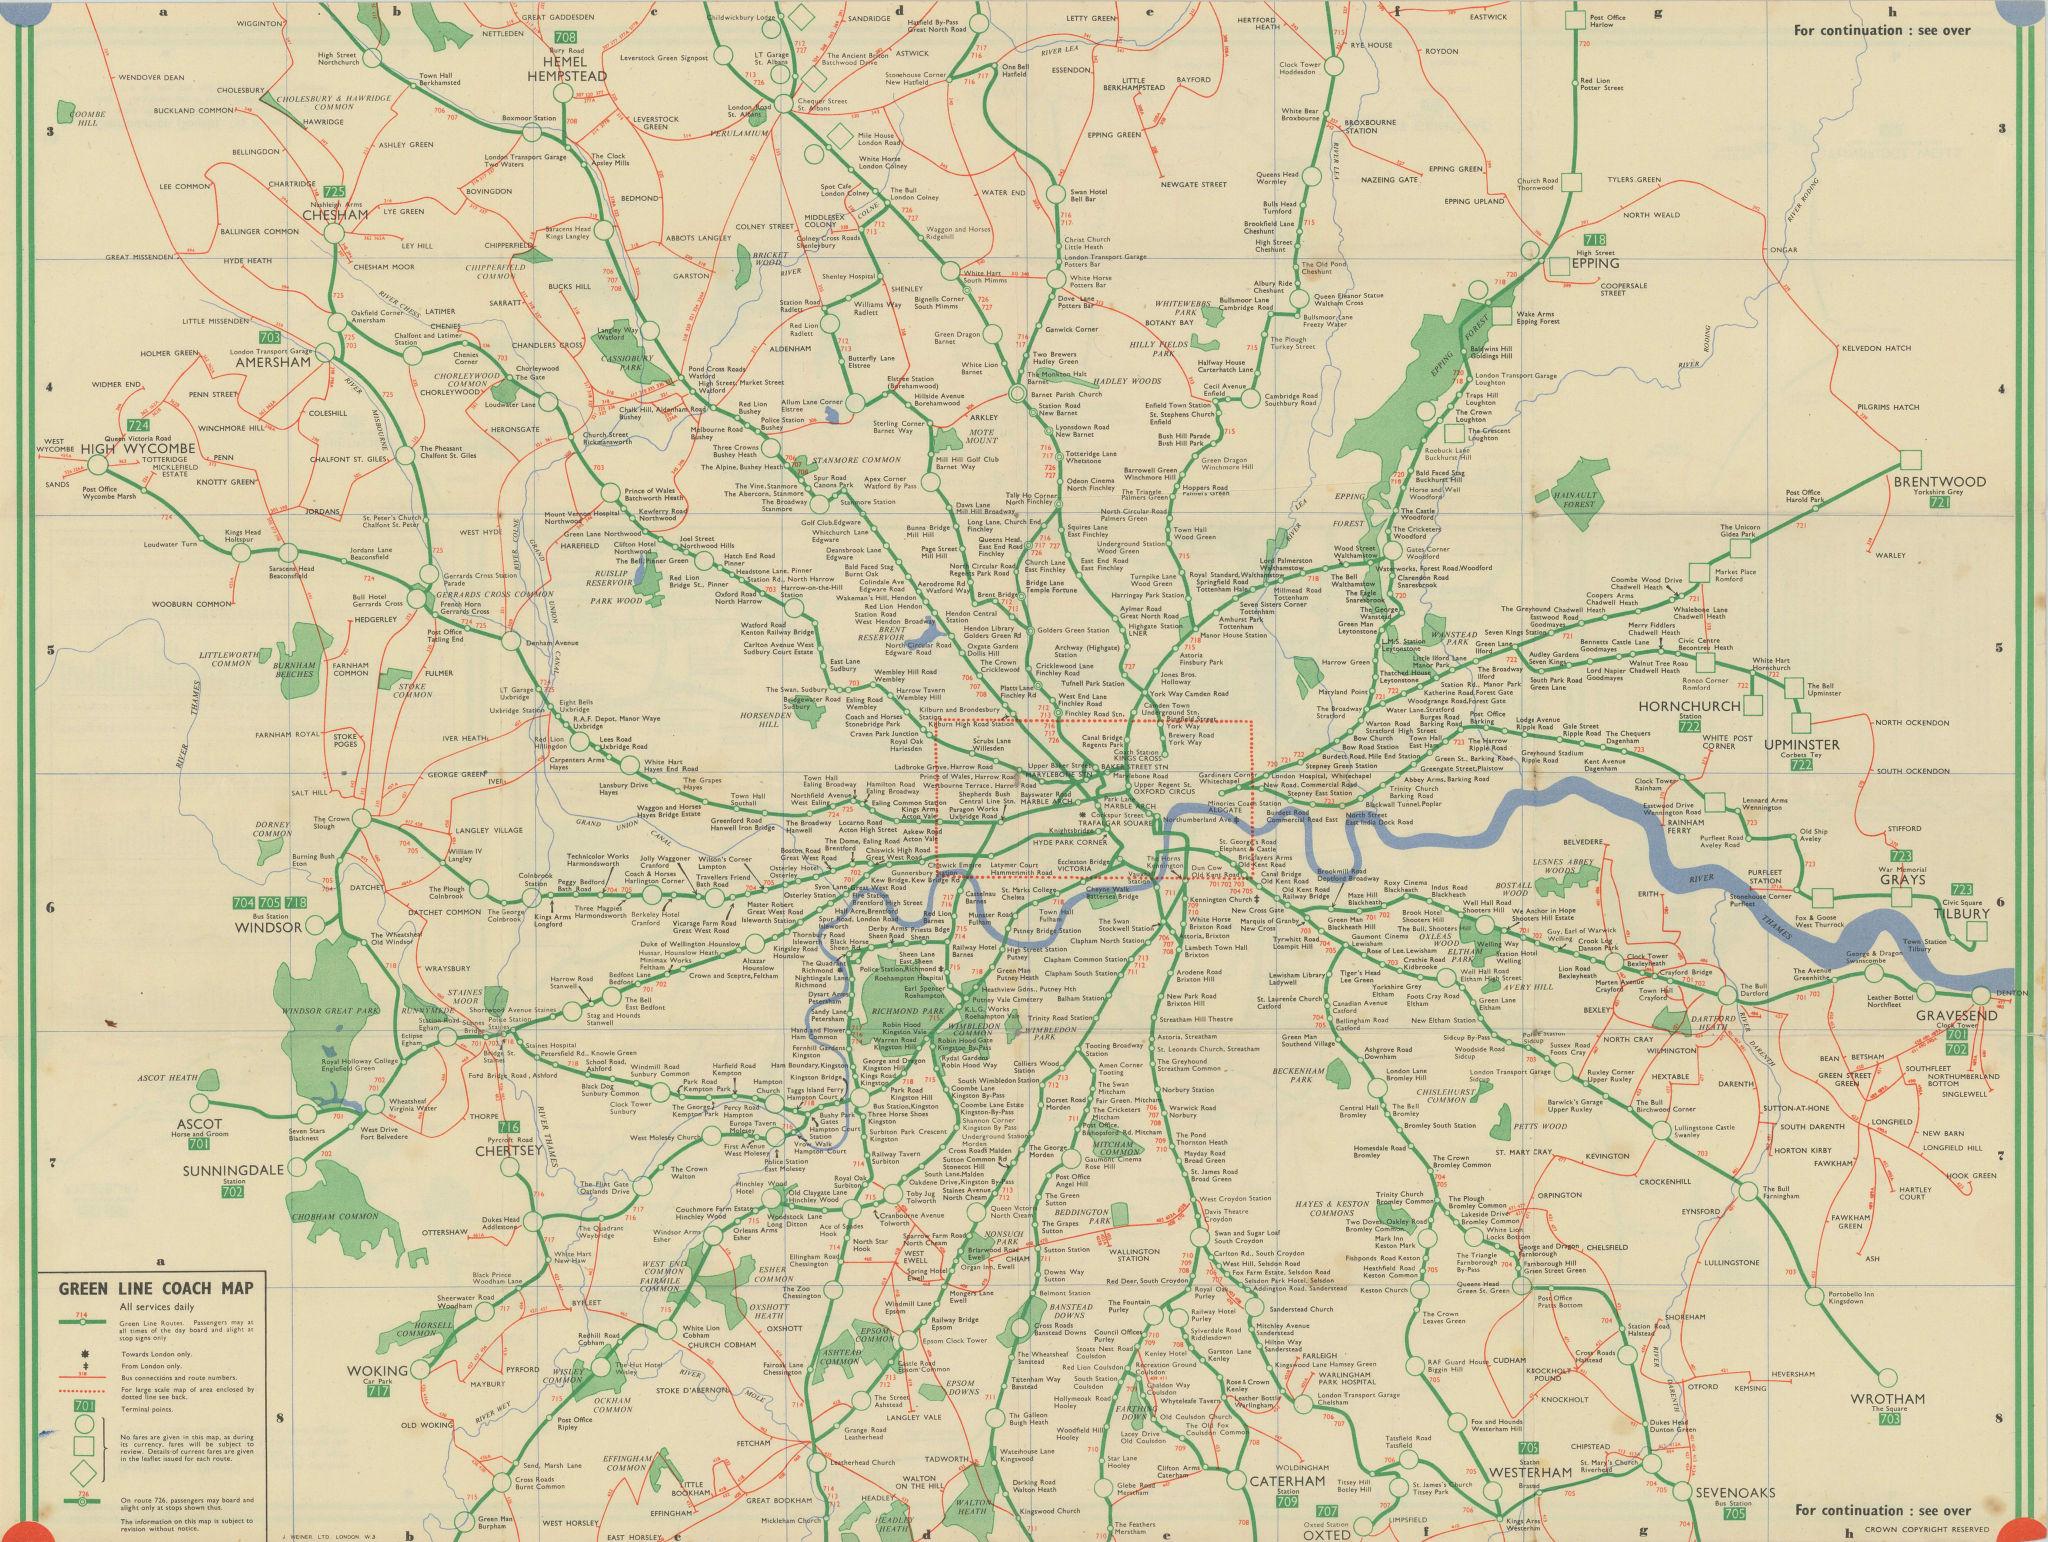 London Transport Green Line Coach map. #1 1947 old vintage plan chart